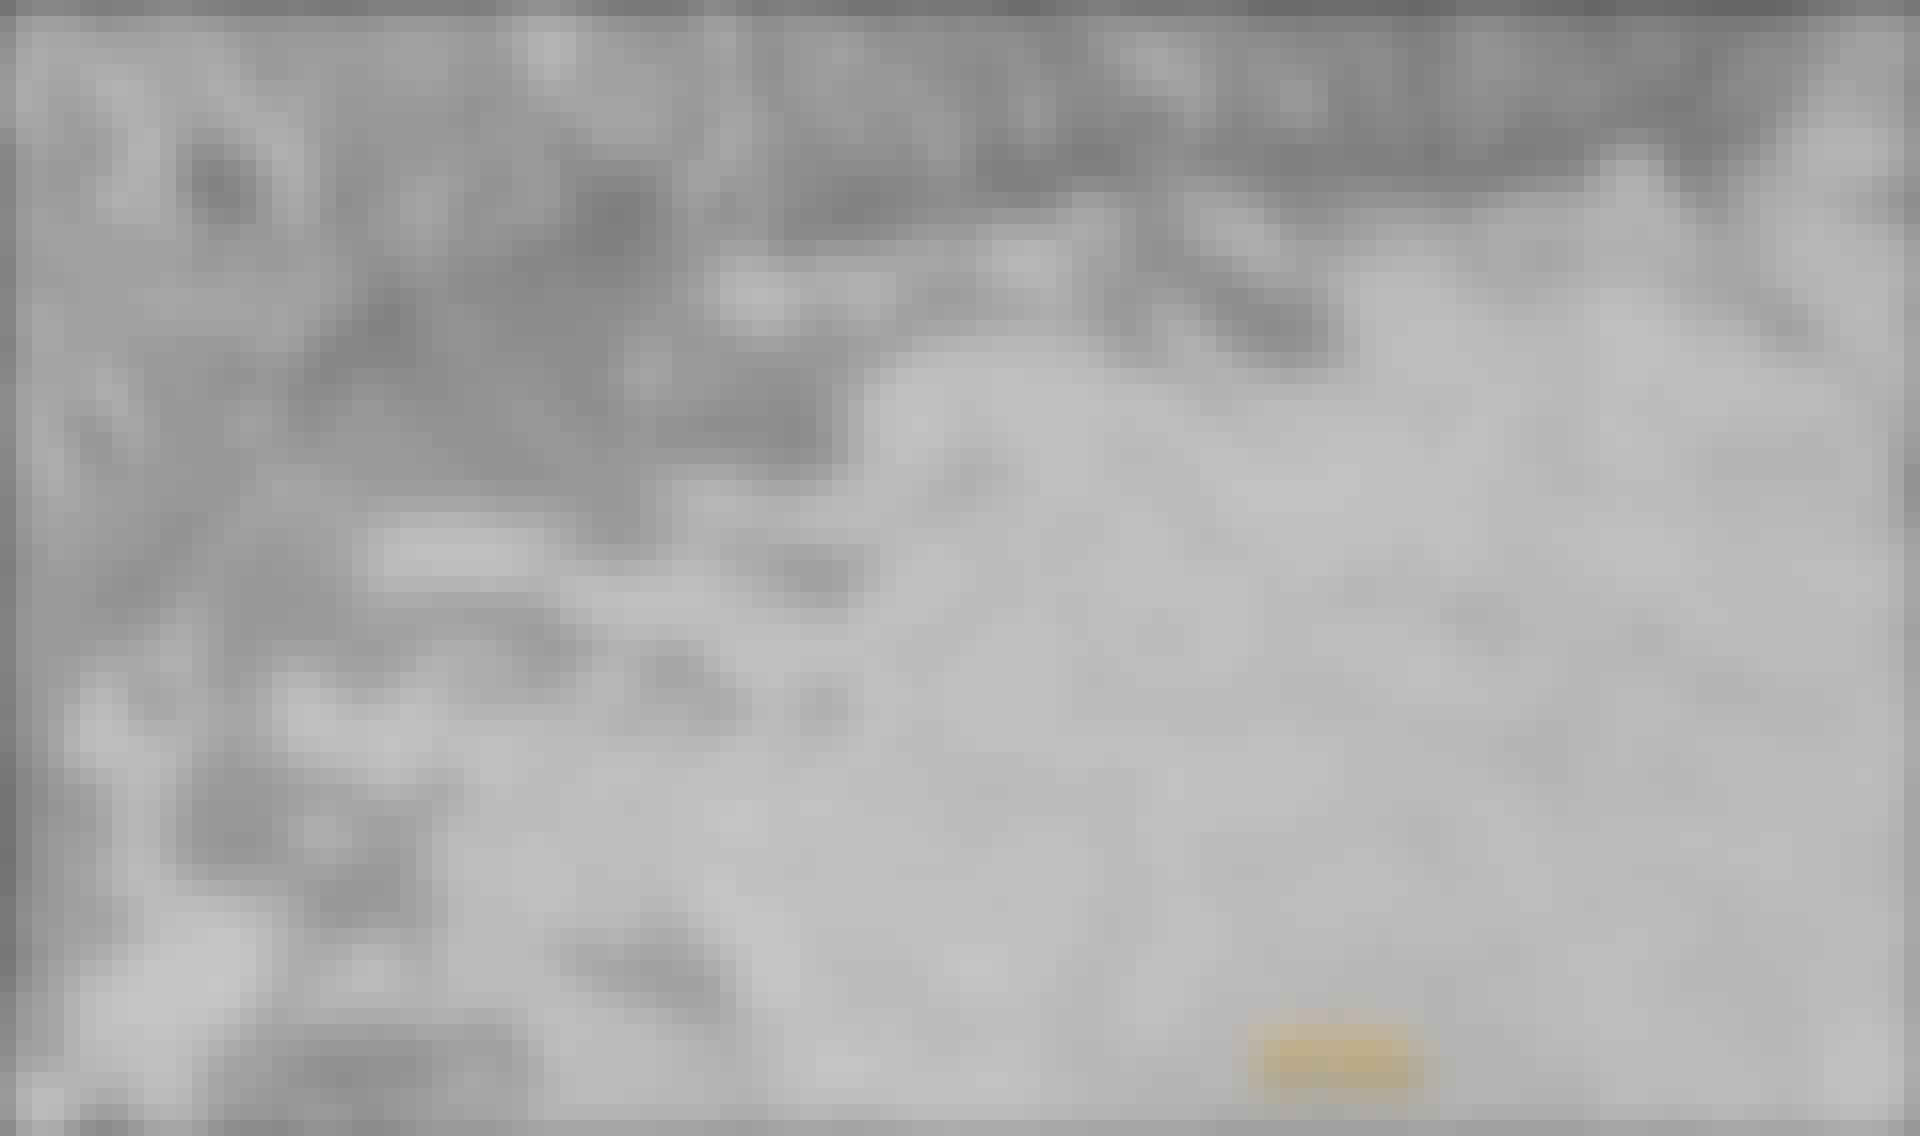 Pluto, Sputnik Planitia